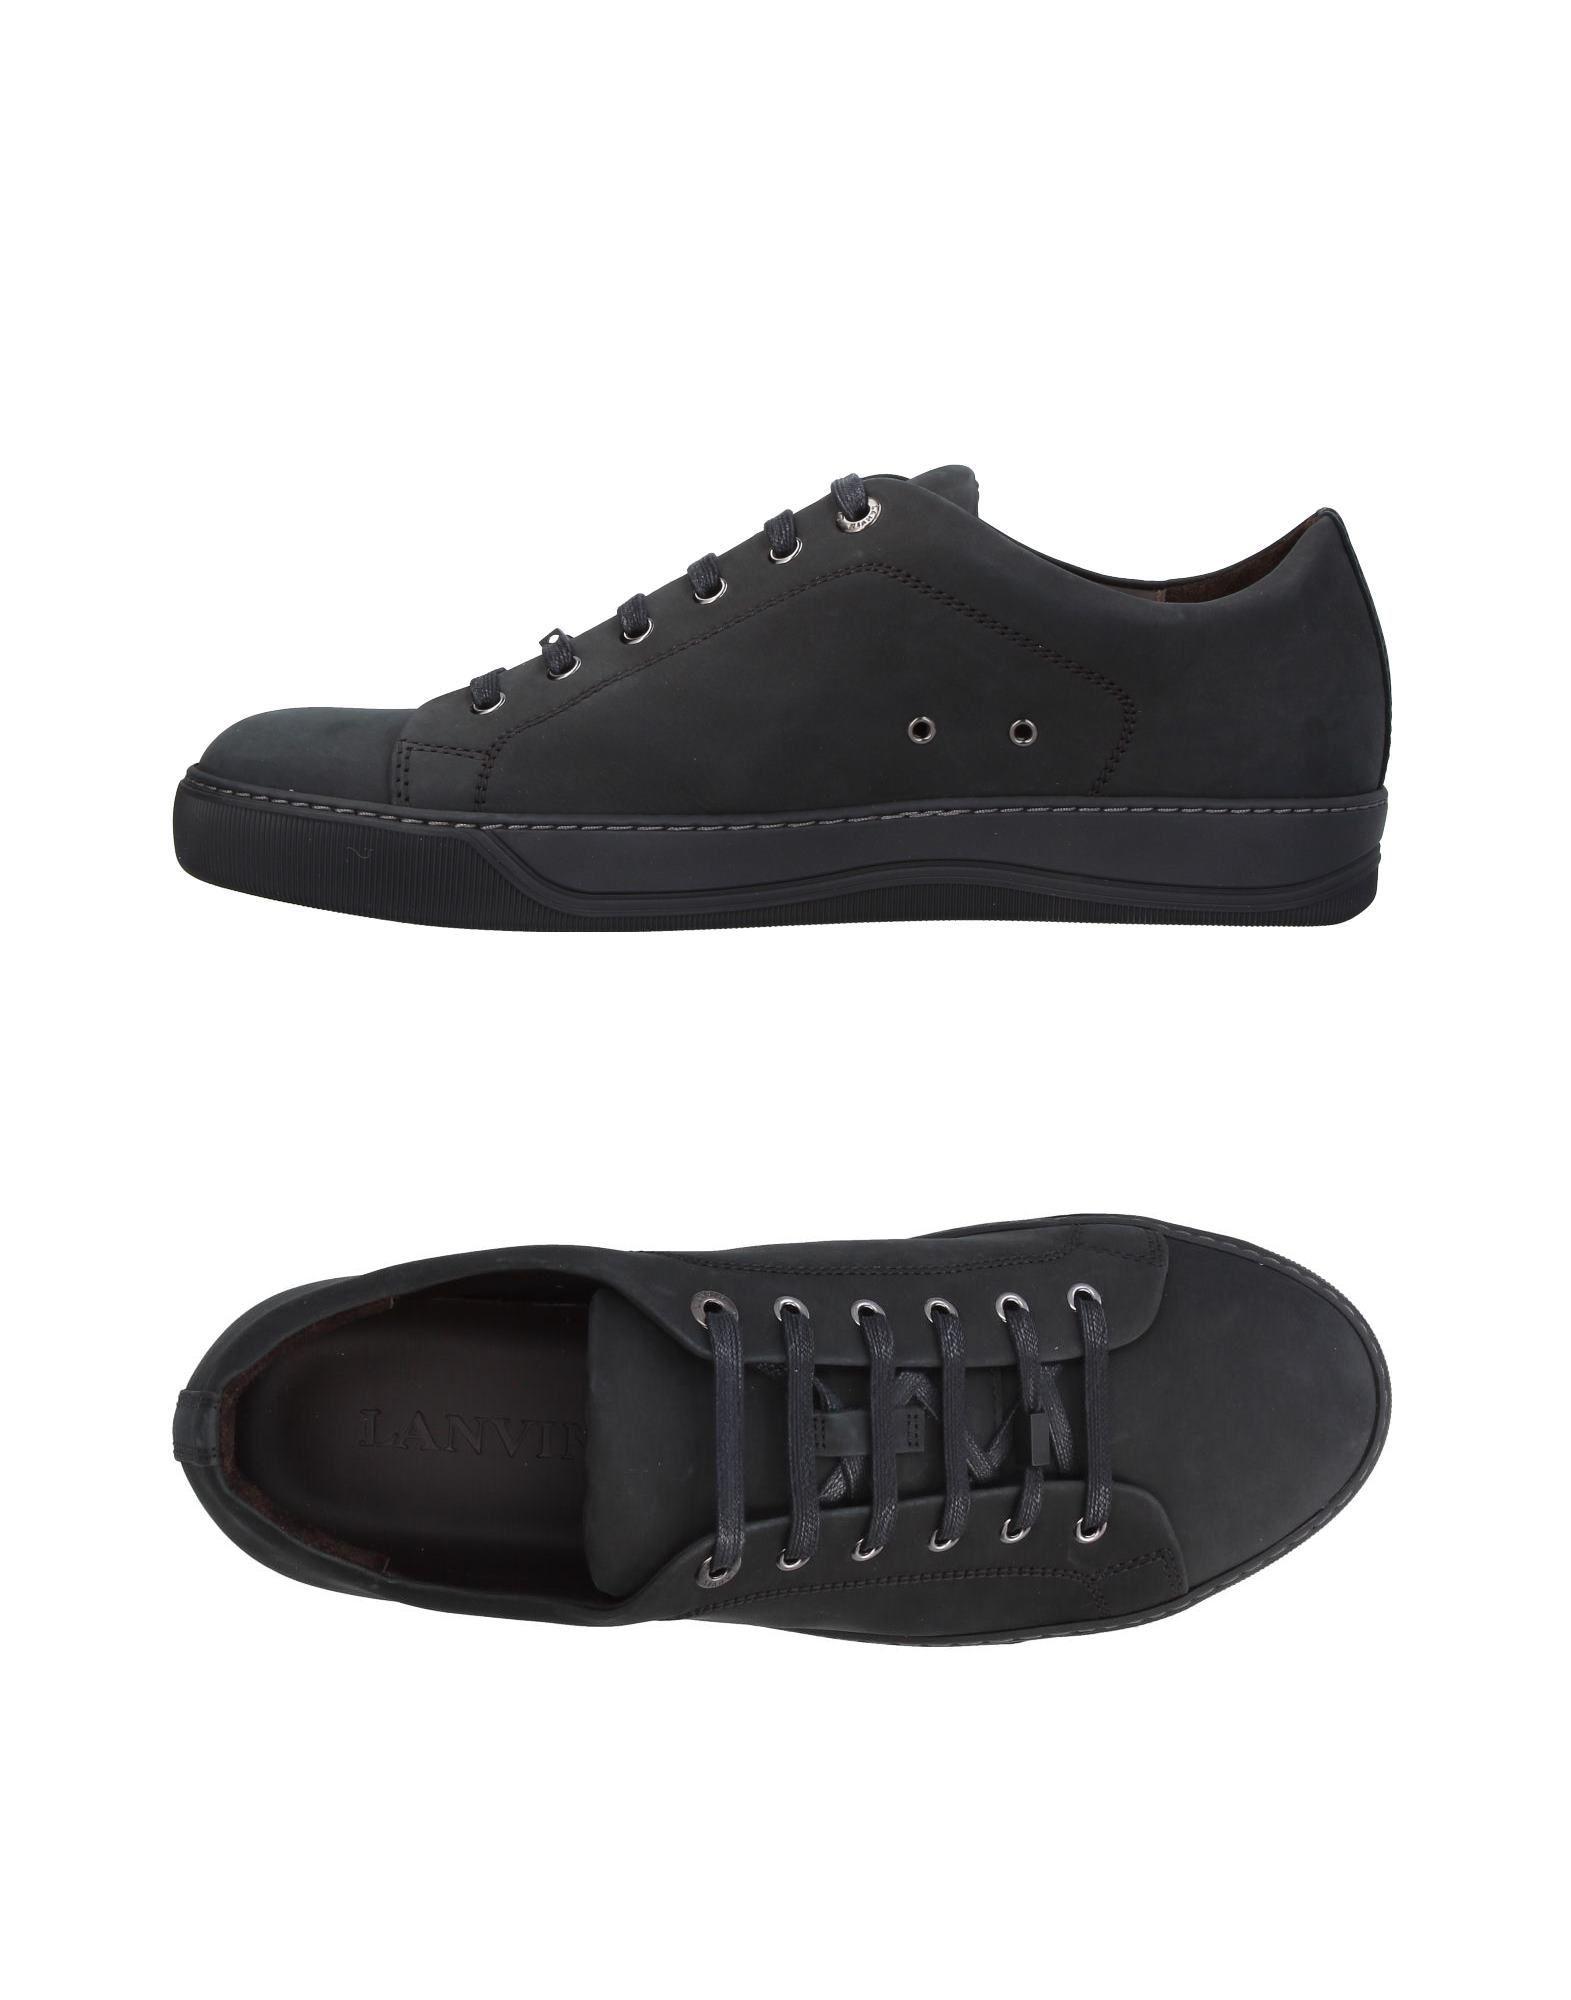 Lanvin Sneakers Herren  11291316UF Gute Qualität beliebte Schuhe